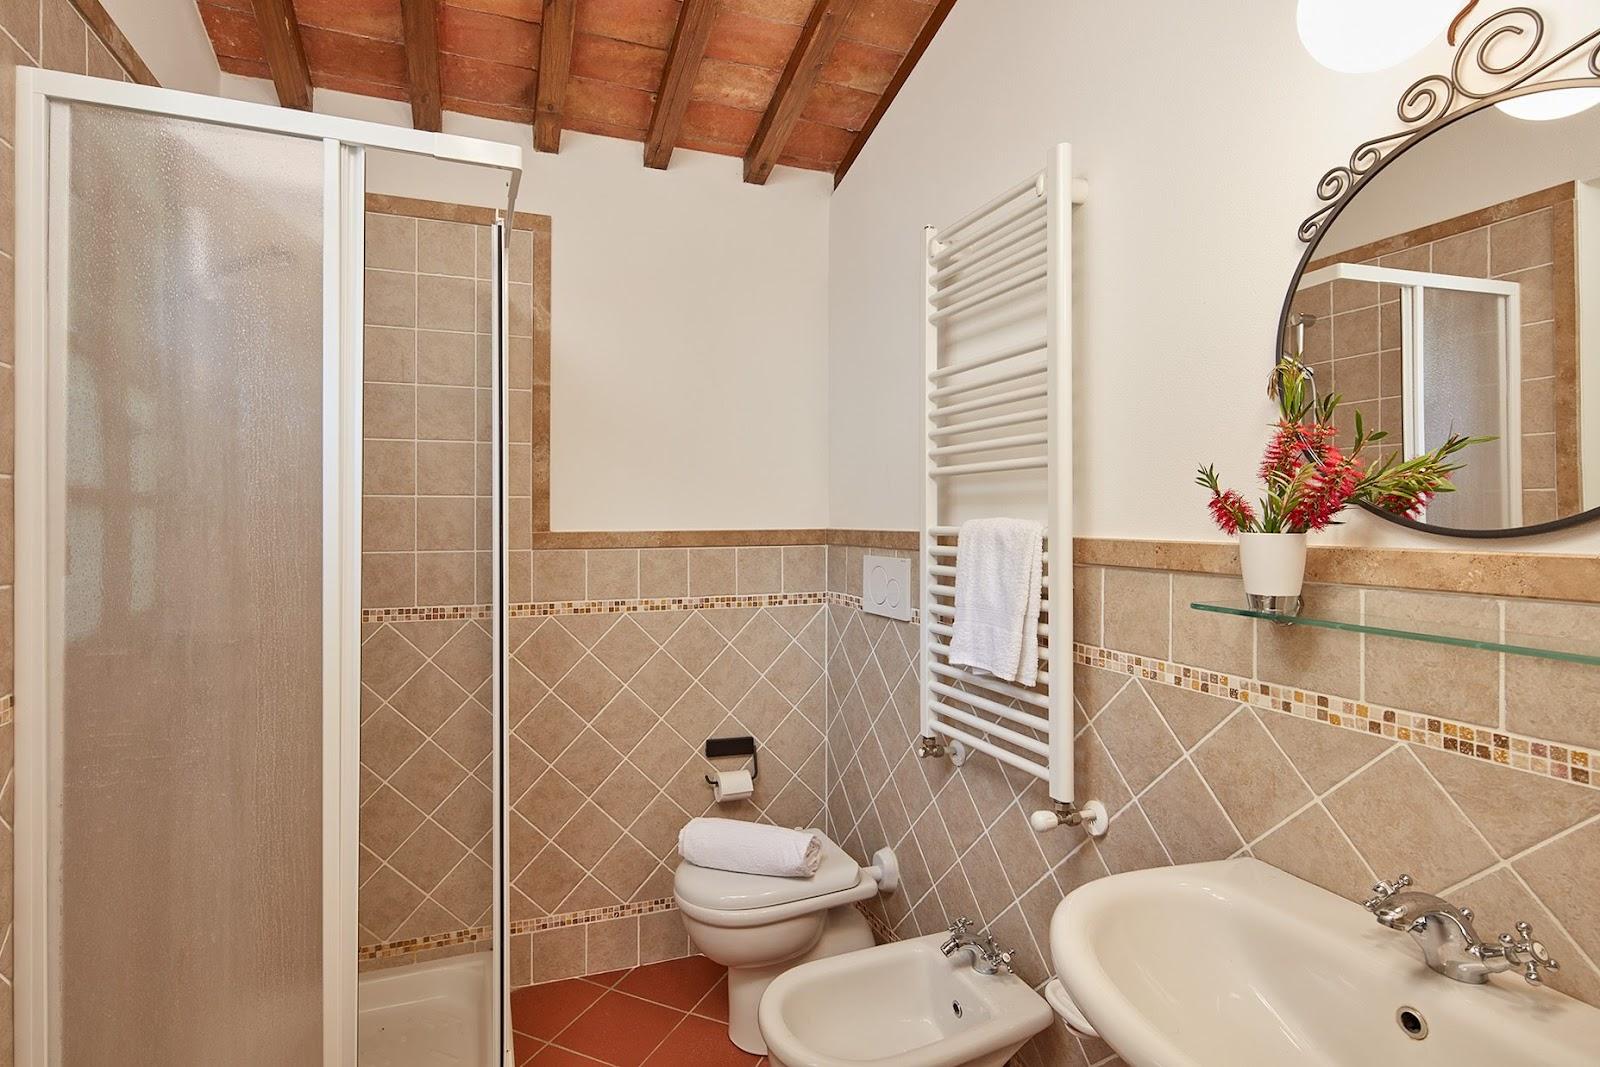 Ferienhaus Corte Paradiso (2570342), Monsummano Terme, Pistoia, Toskana, Italien, Bild 44